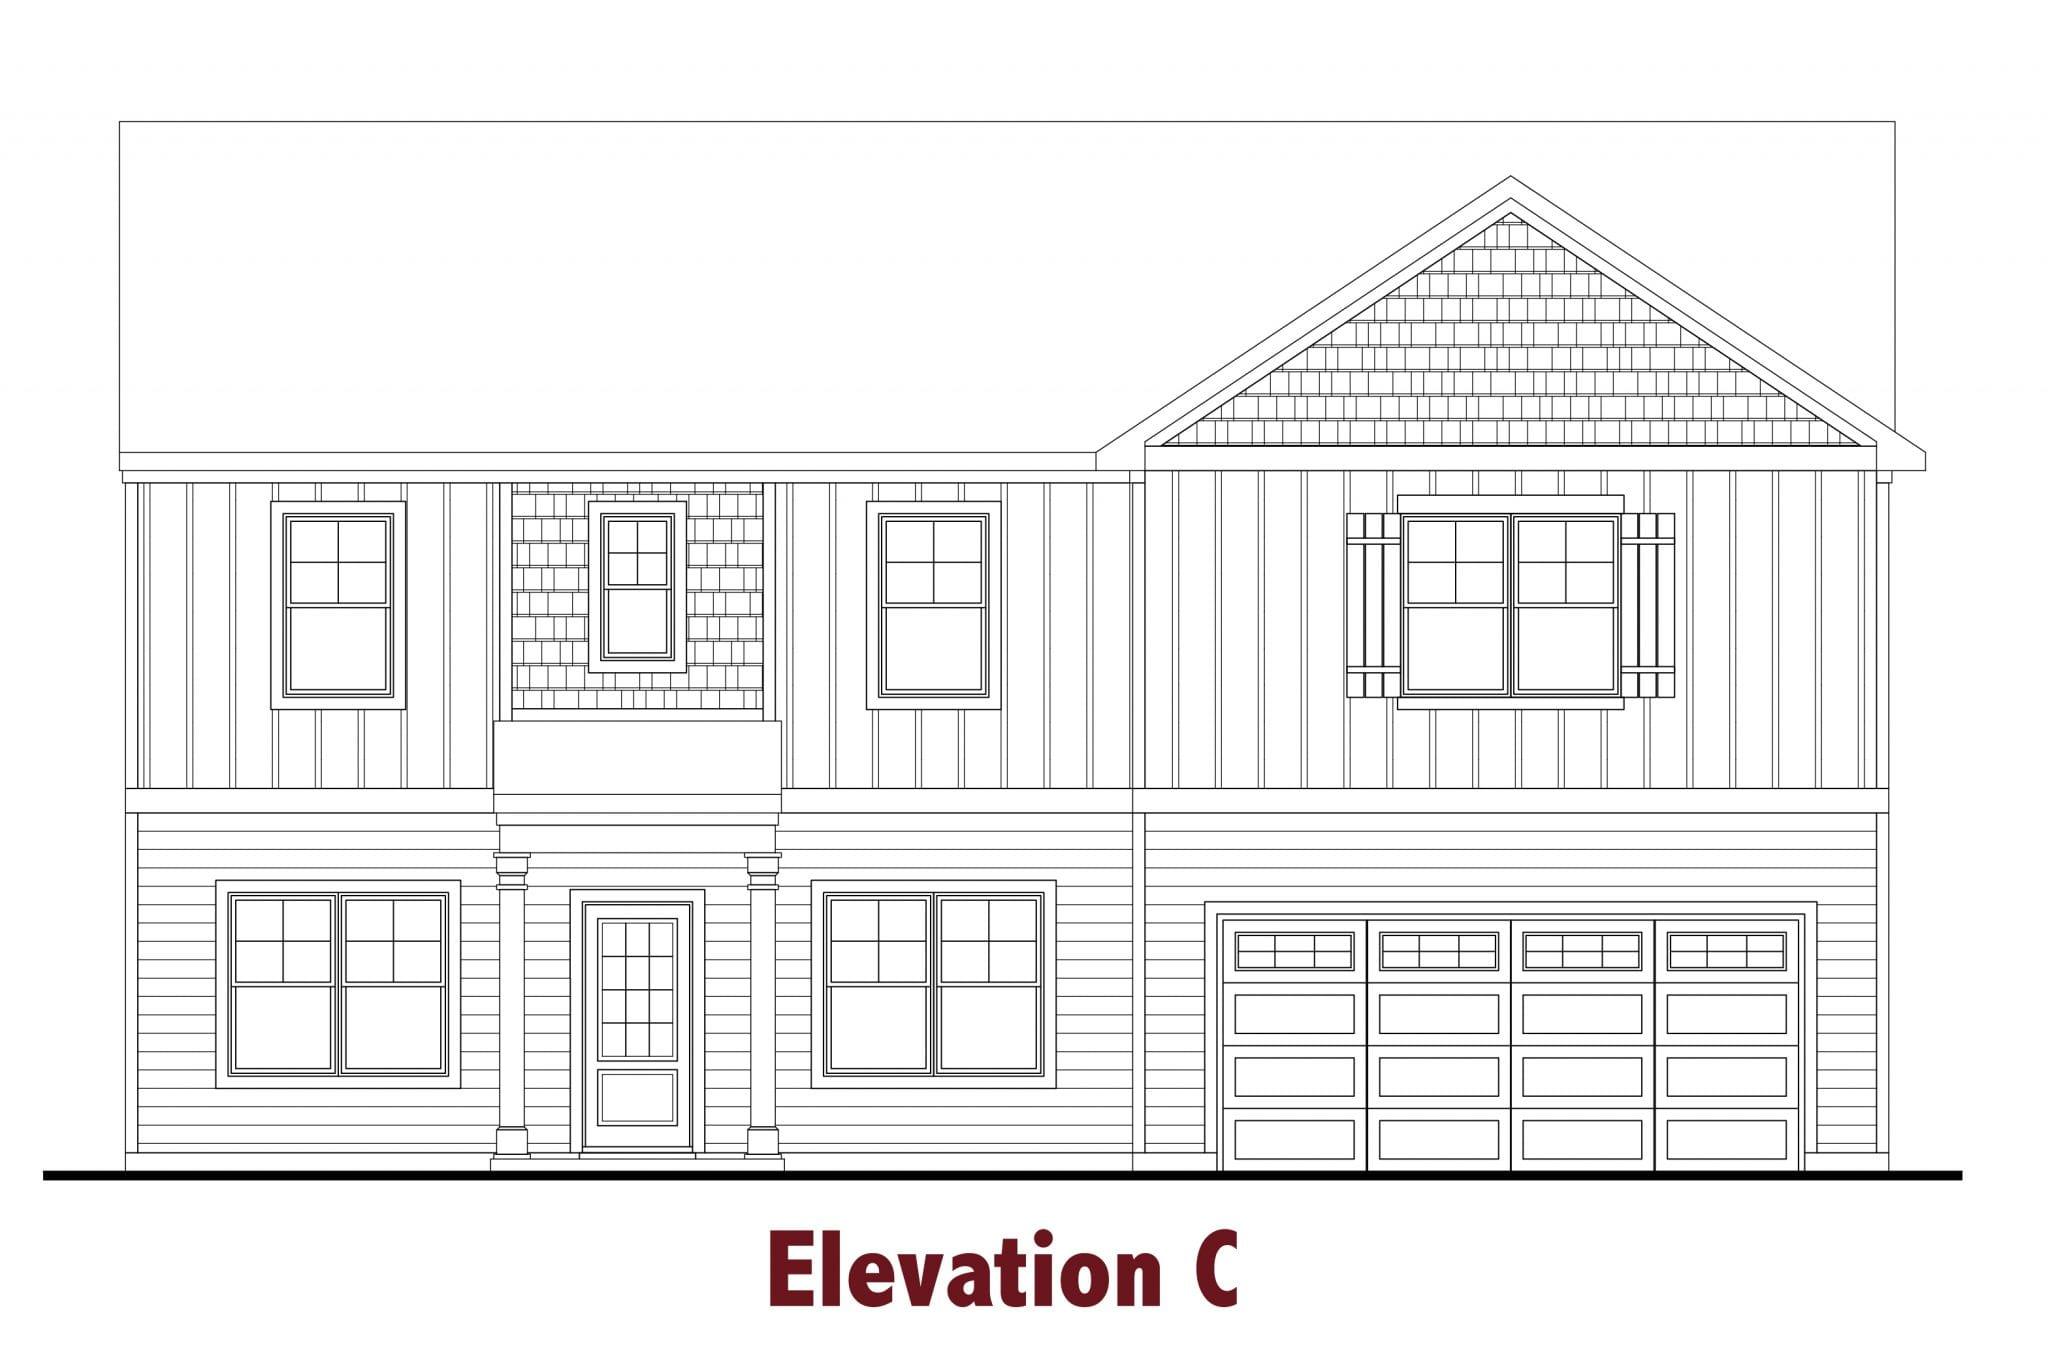 Greenbrier elevations Image